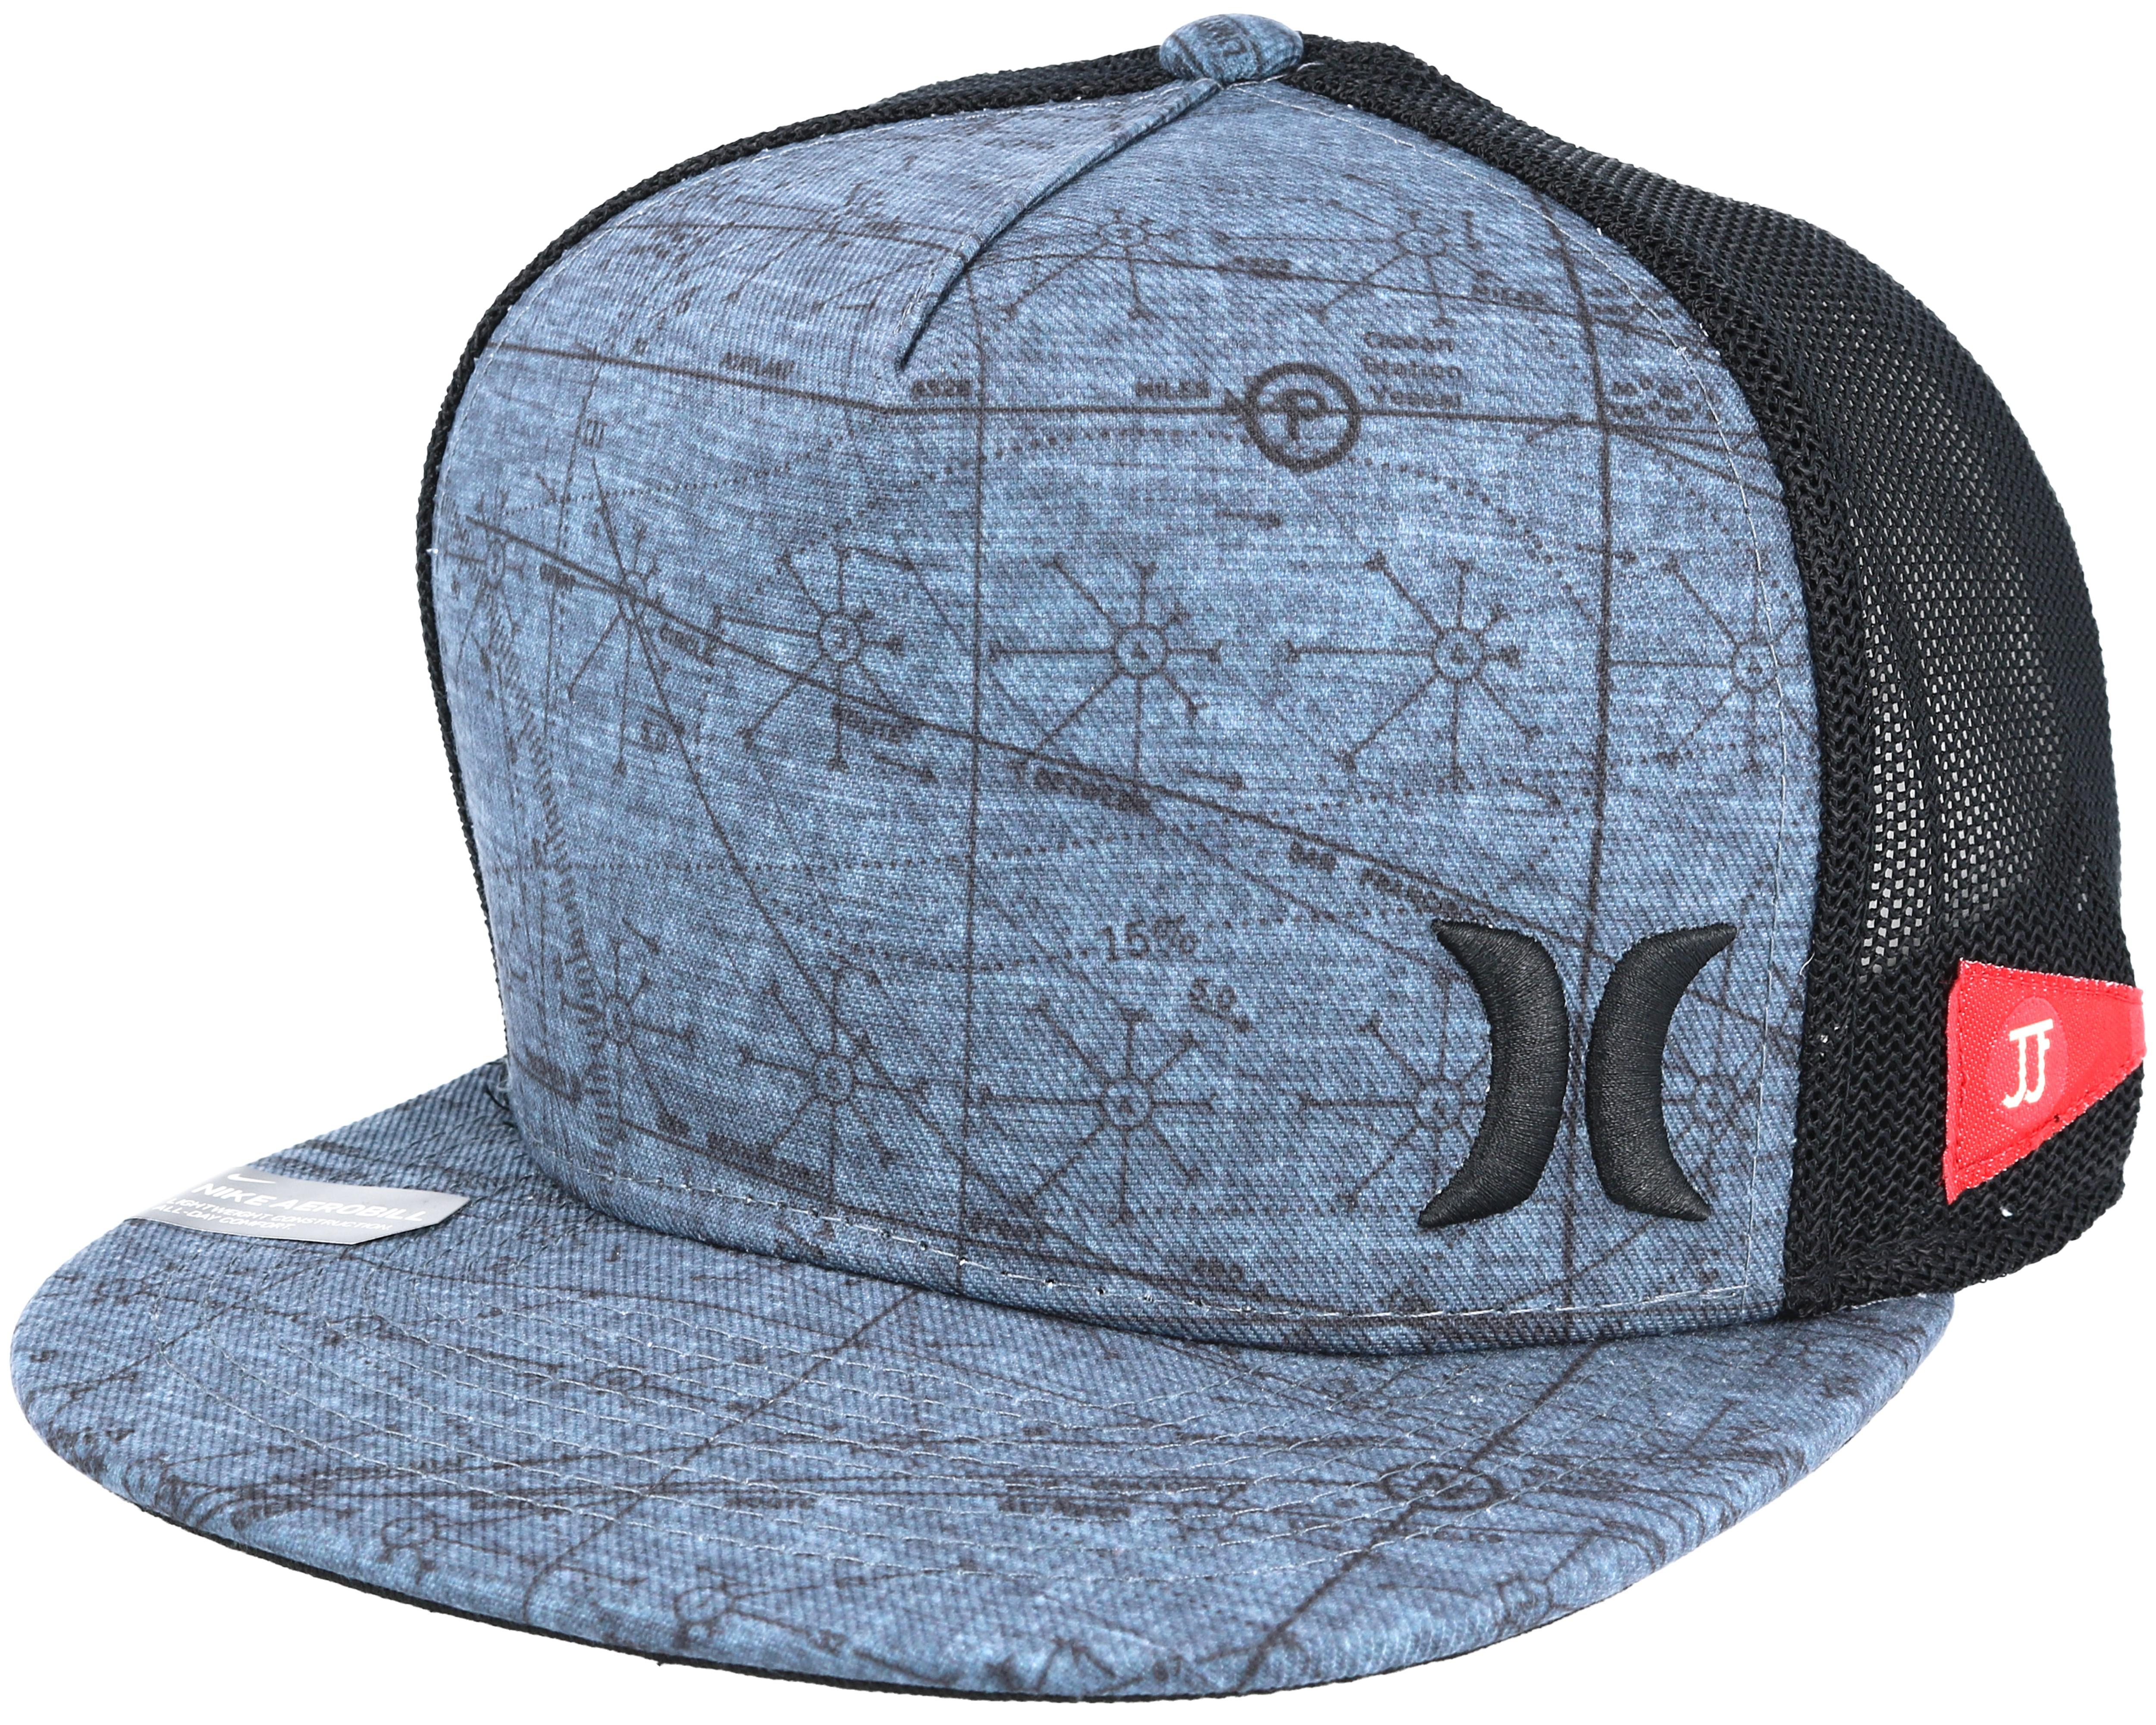 new style b5844 934ab ... free shipping jjf maps trucker navy black snapback hurley caps hatstore  d58c7 b8957